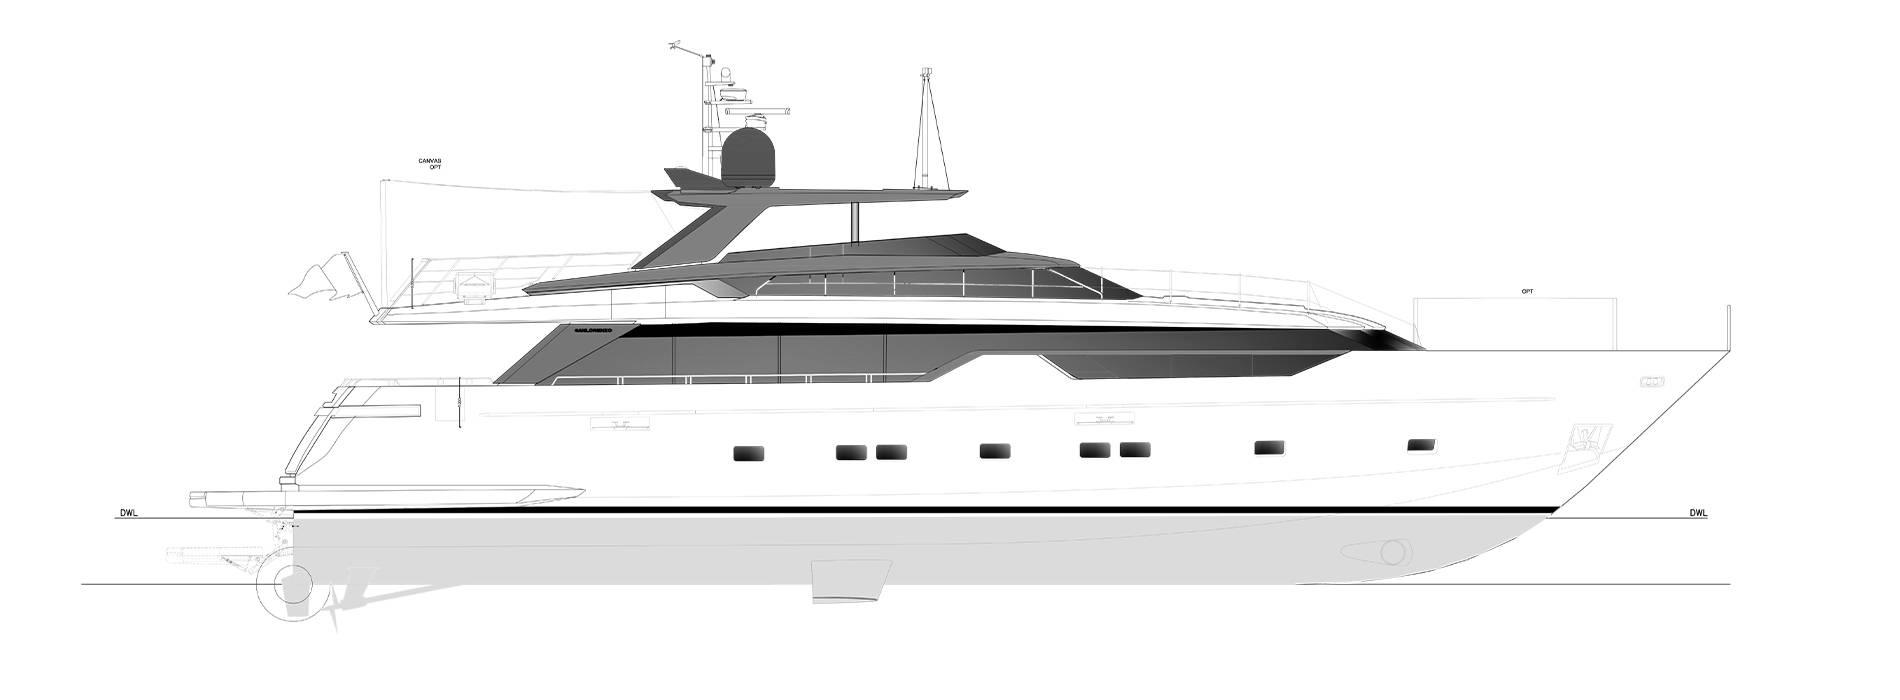 Sanlorenzo Yachts SL102A-746 under offer Profile